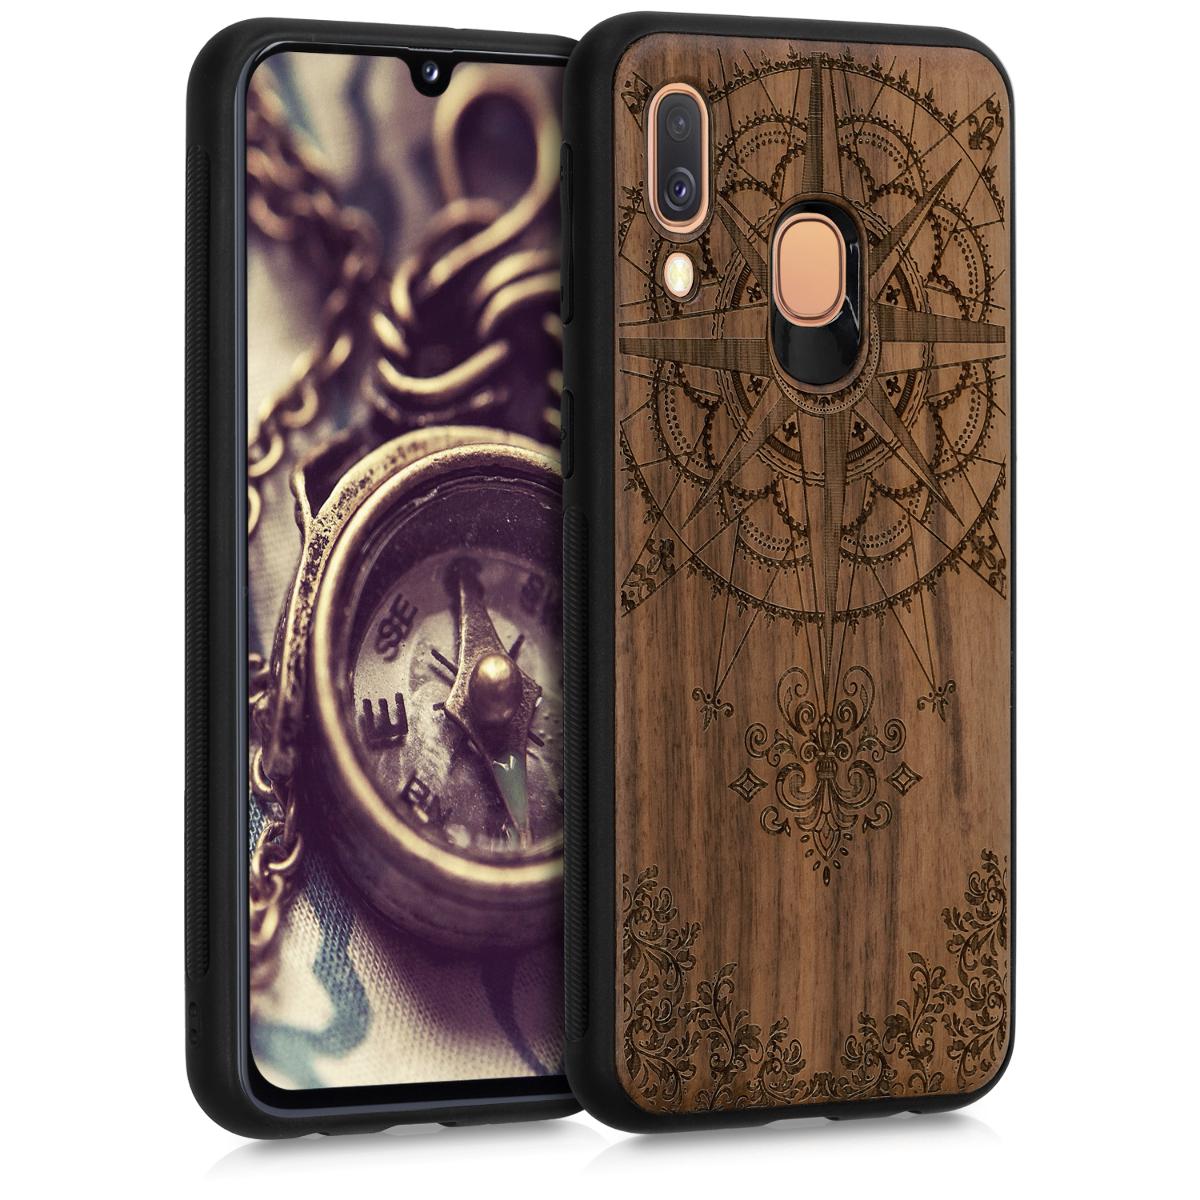 KW Σκληρή Ξύλινη Θήκη - Samsung Galaxy A40 - Baroque Compass (48552.01)